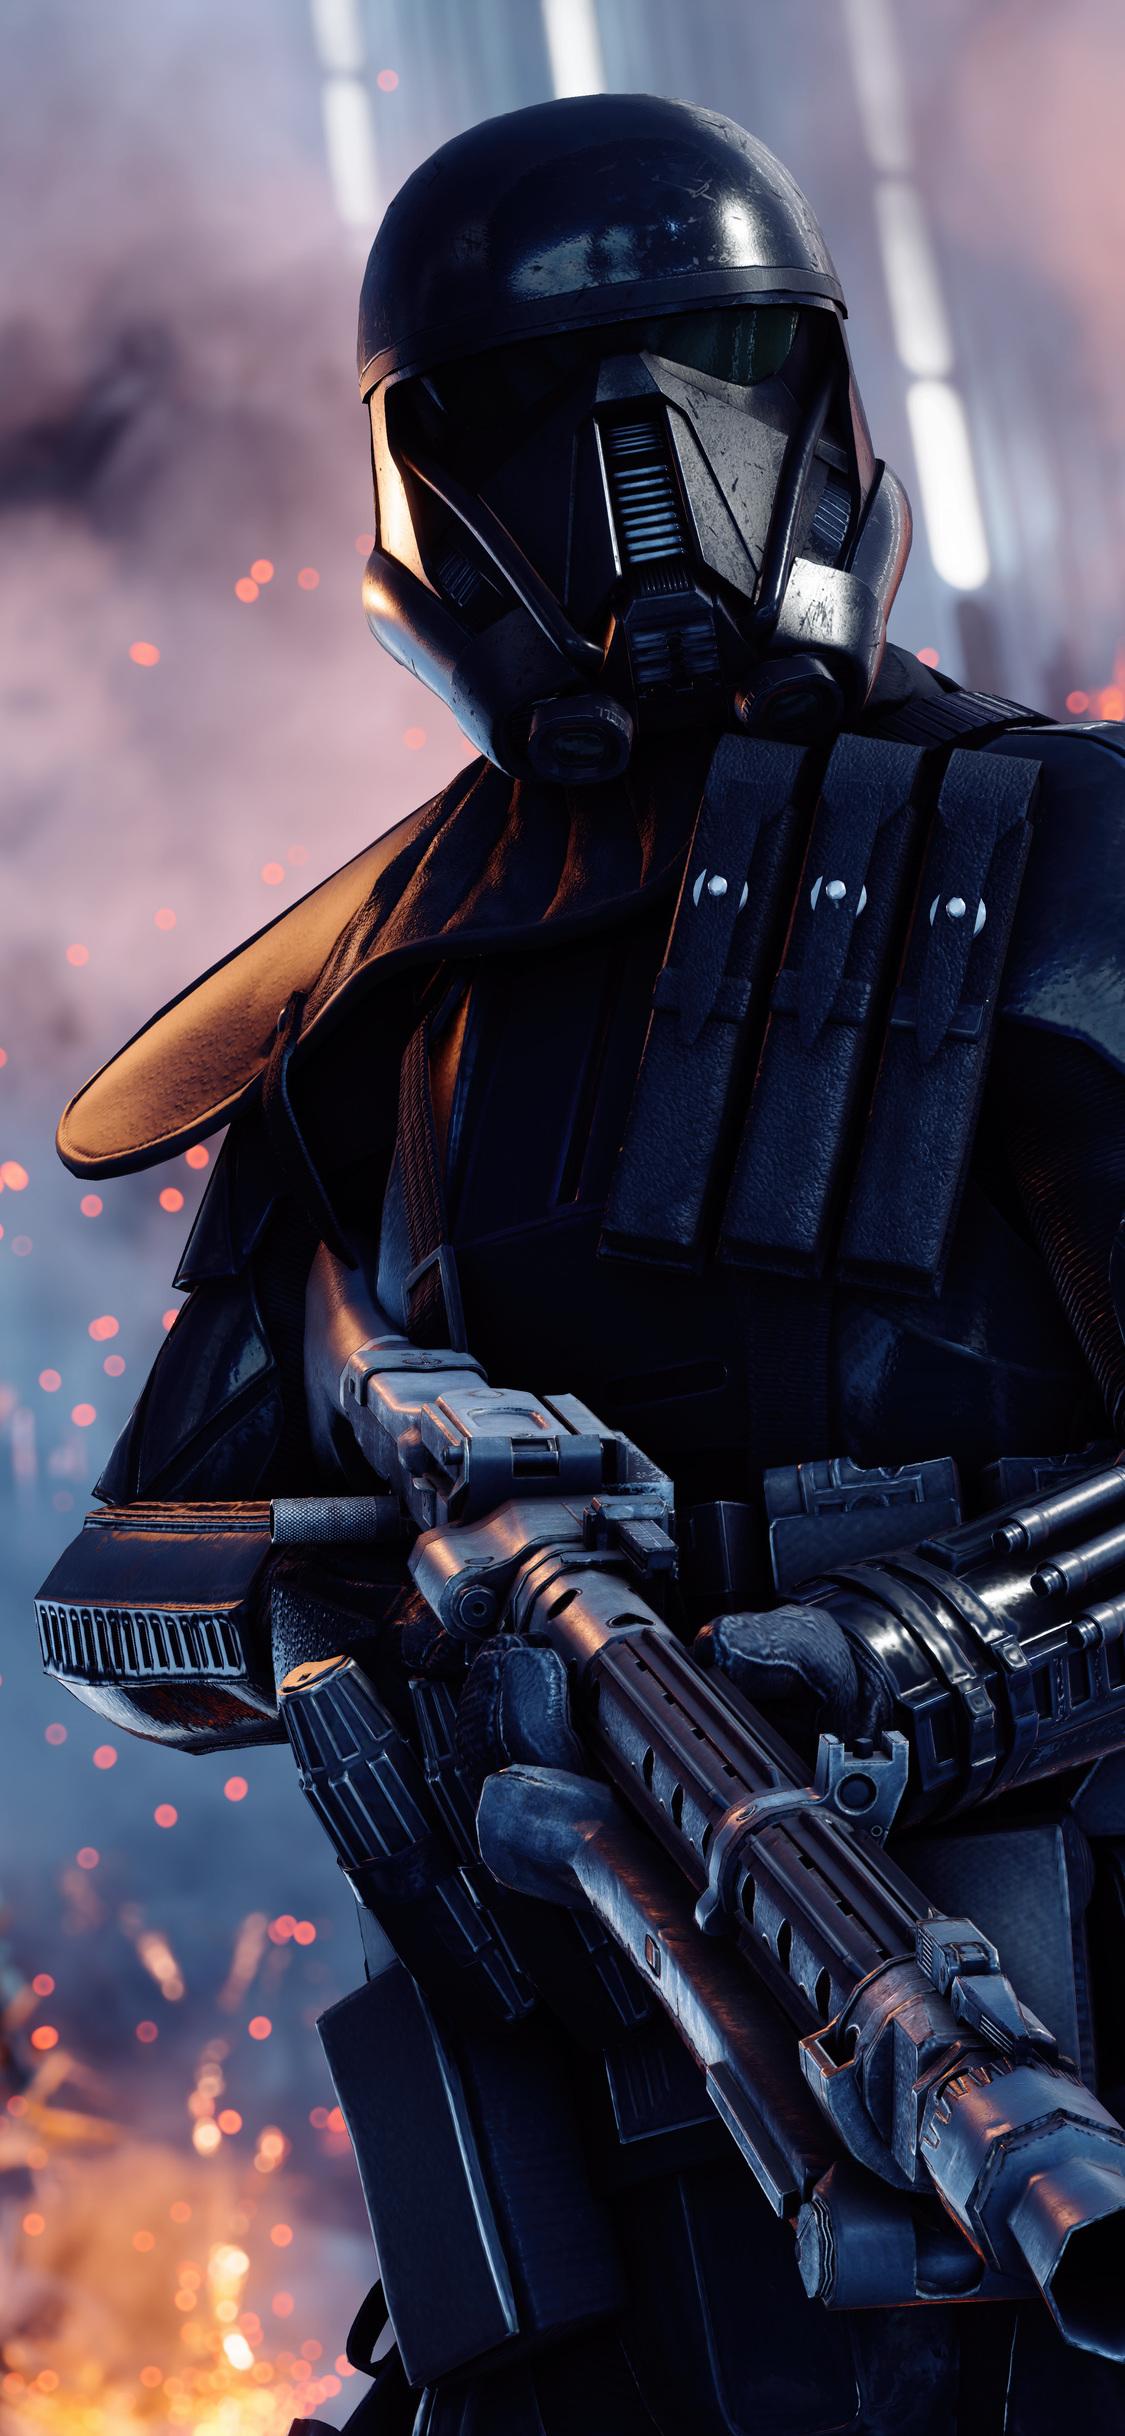 1125x2436 Death Trooper Star Wars Battlefront II Iphone XS ...